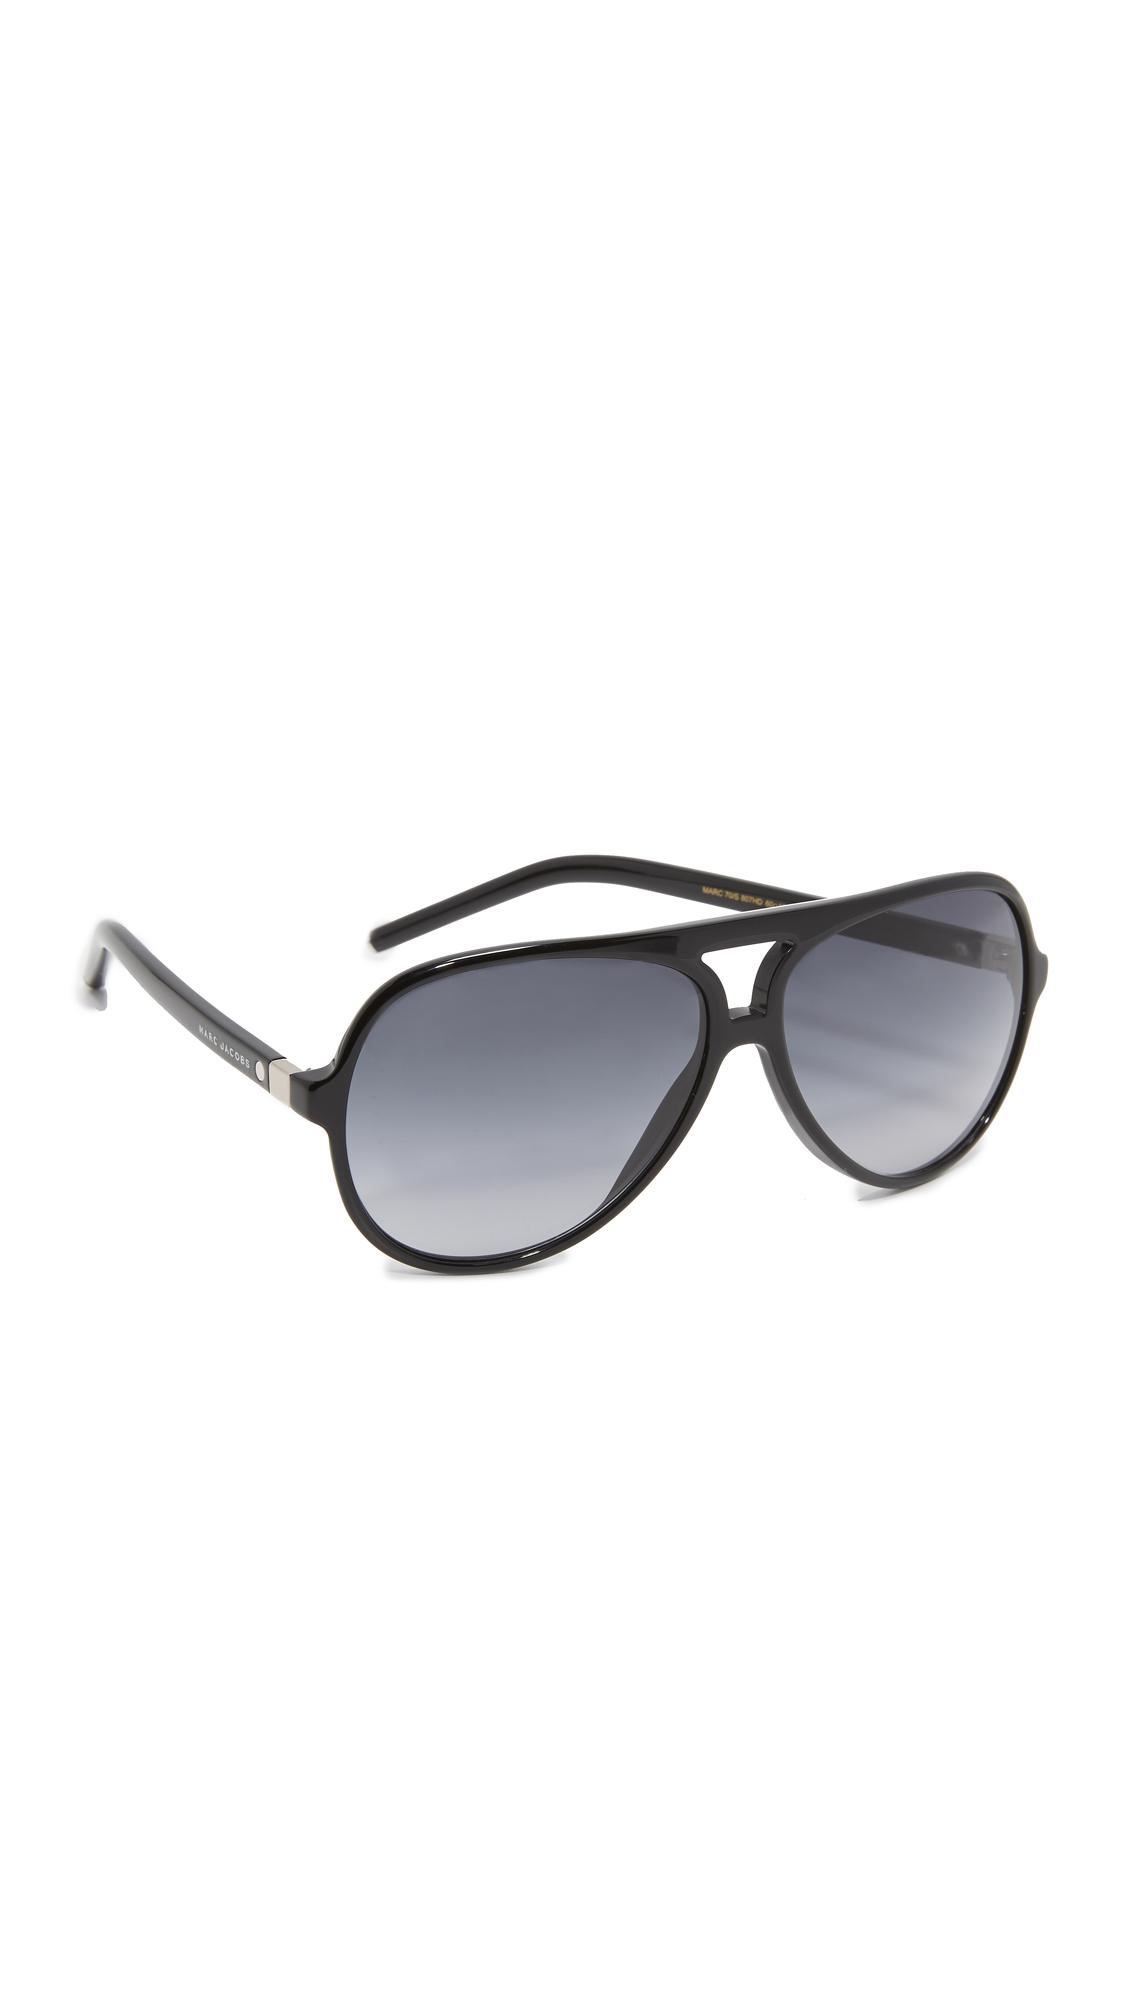 fdbe179dec35 Black Aviator Sunglasses Kim Kardashian Wears « One More Soul